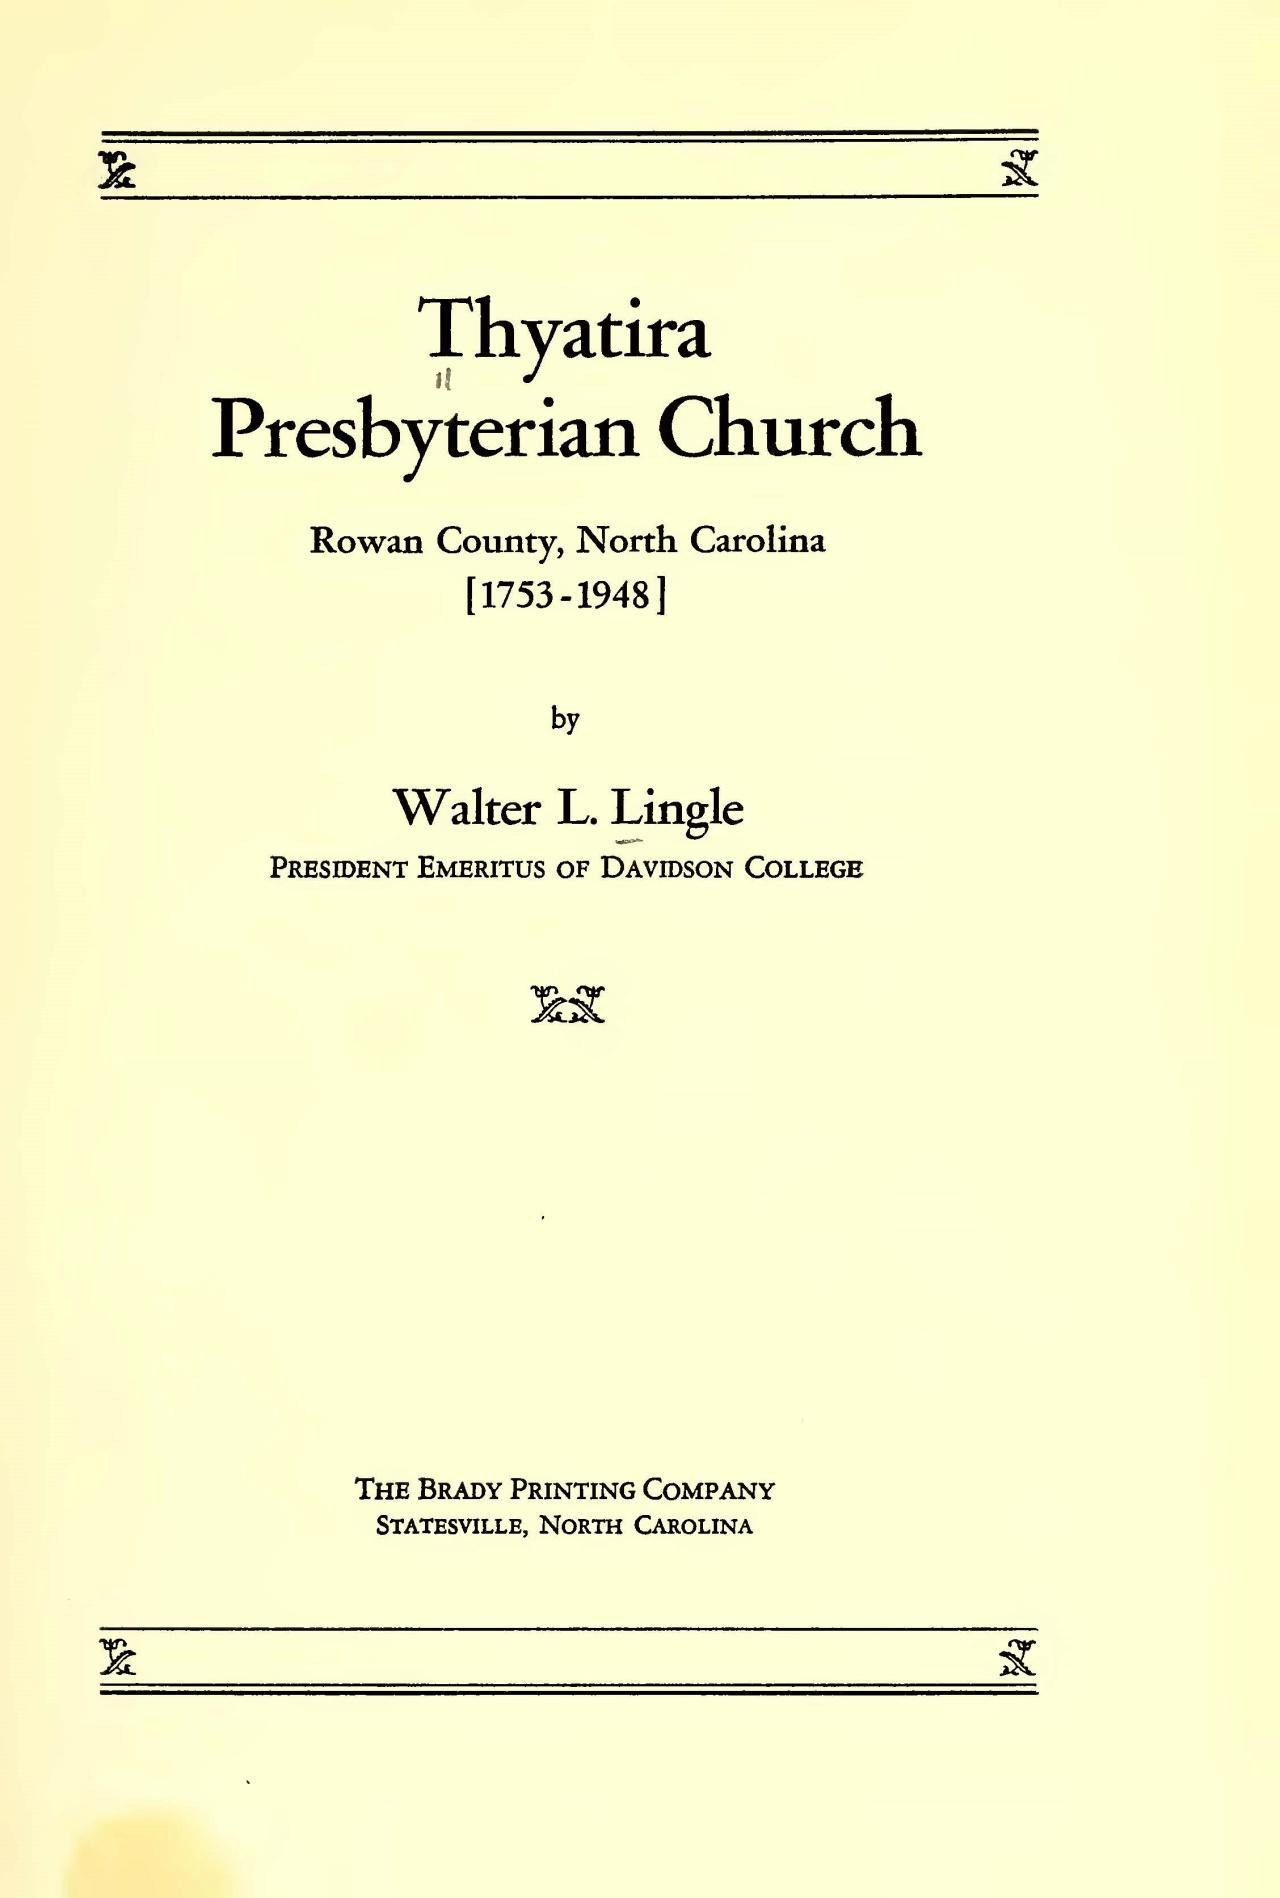 Lingle, Walter Lee, Thyatira Presbyterian Church Title Page.jpg